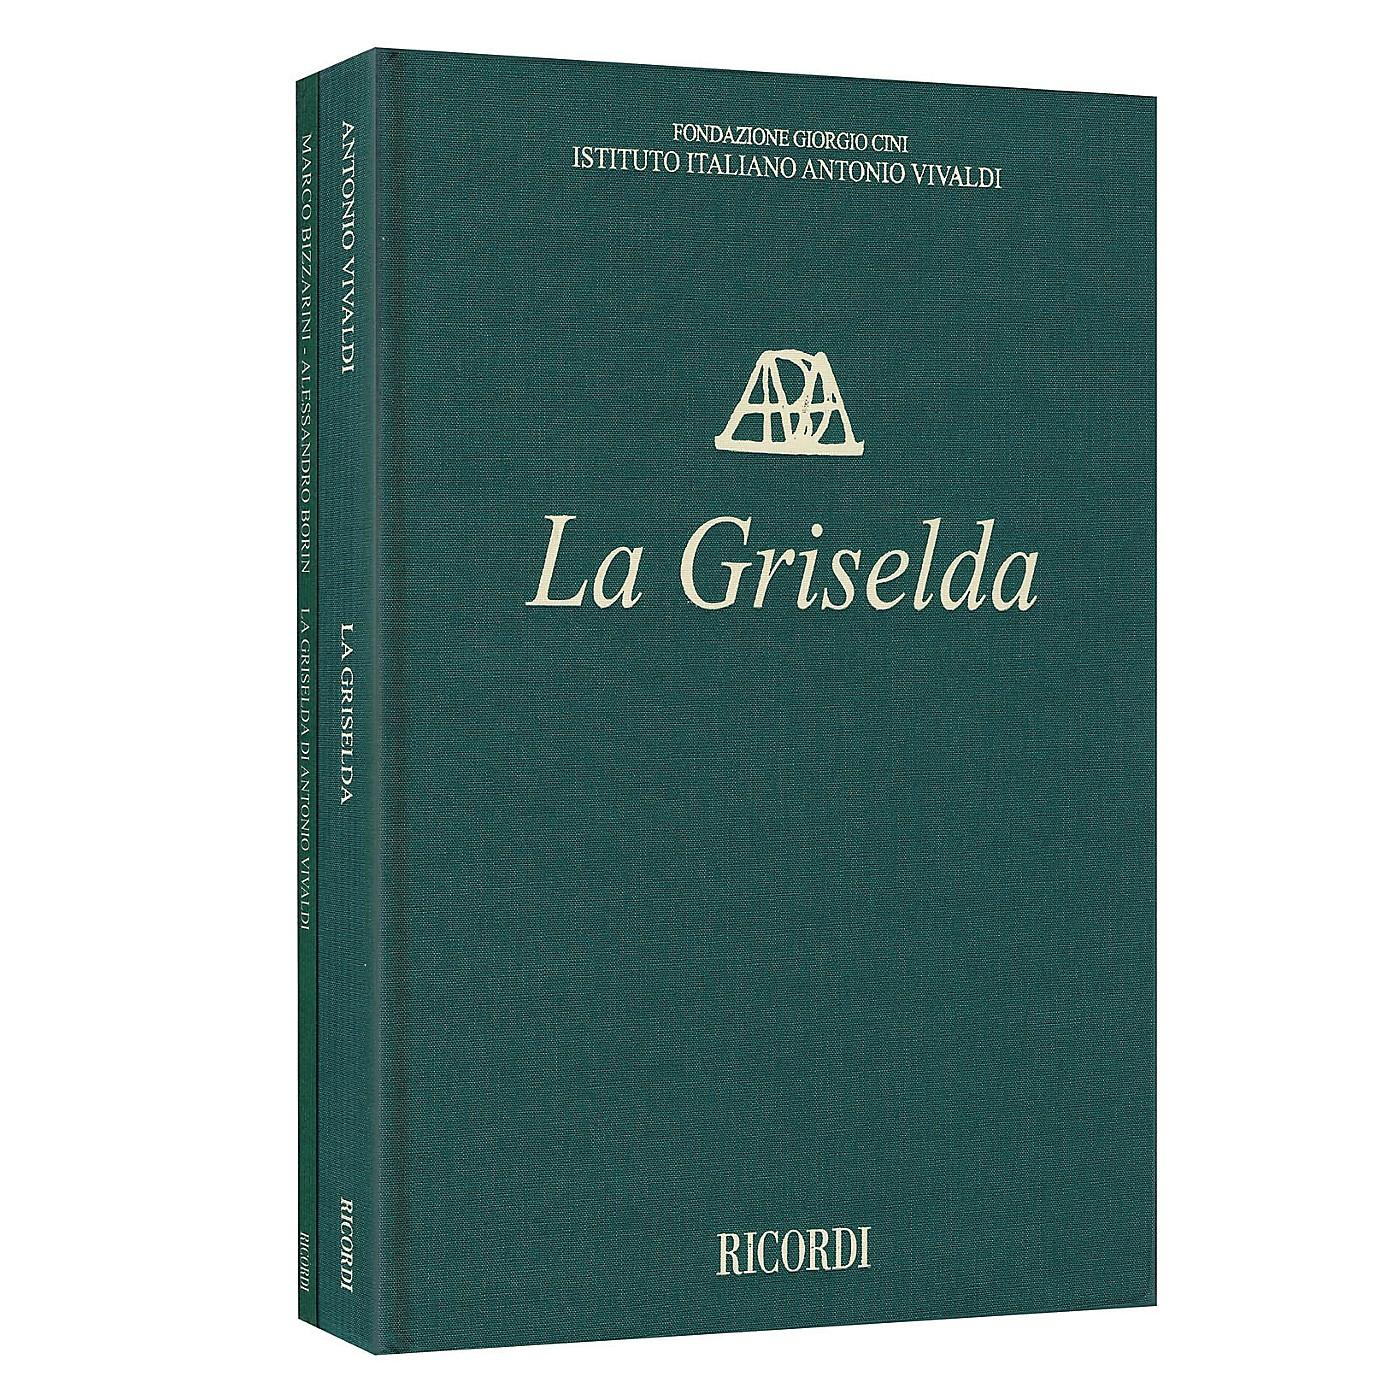 Ricordi La Griselda RV 718 - Critical Edition of the Works of Vivaldi Hardcover Edited by Alessandro Borin thumbnail